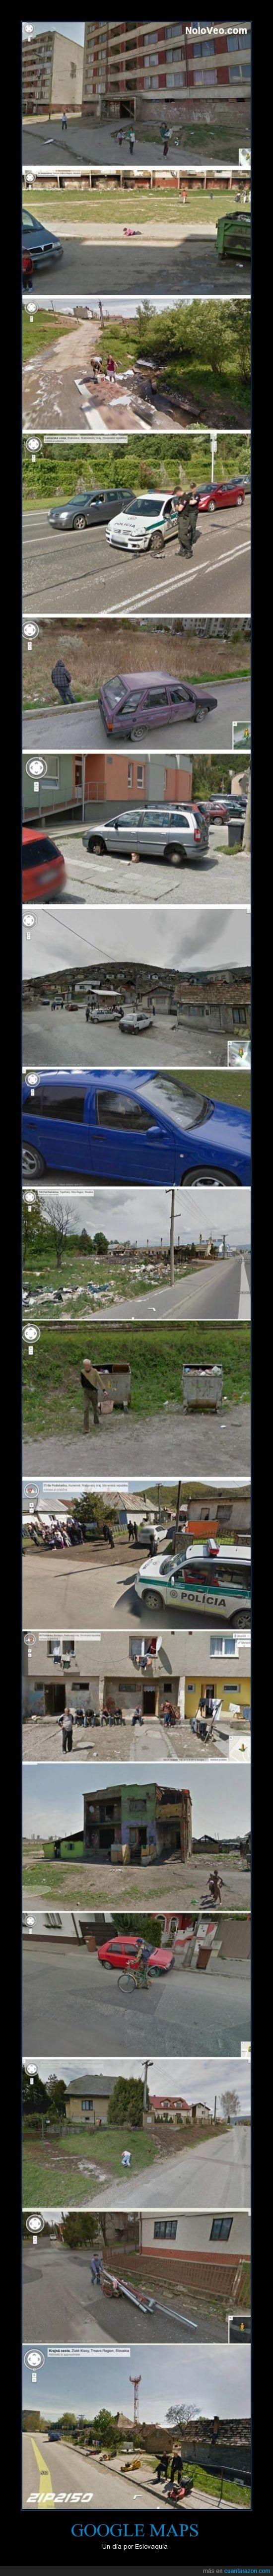 Eslovaquia,google maps,insultar,pobre,policía,robar